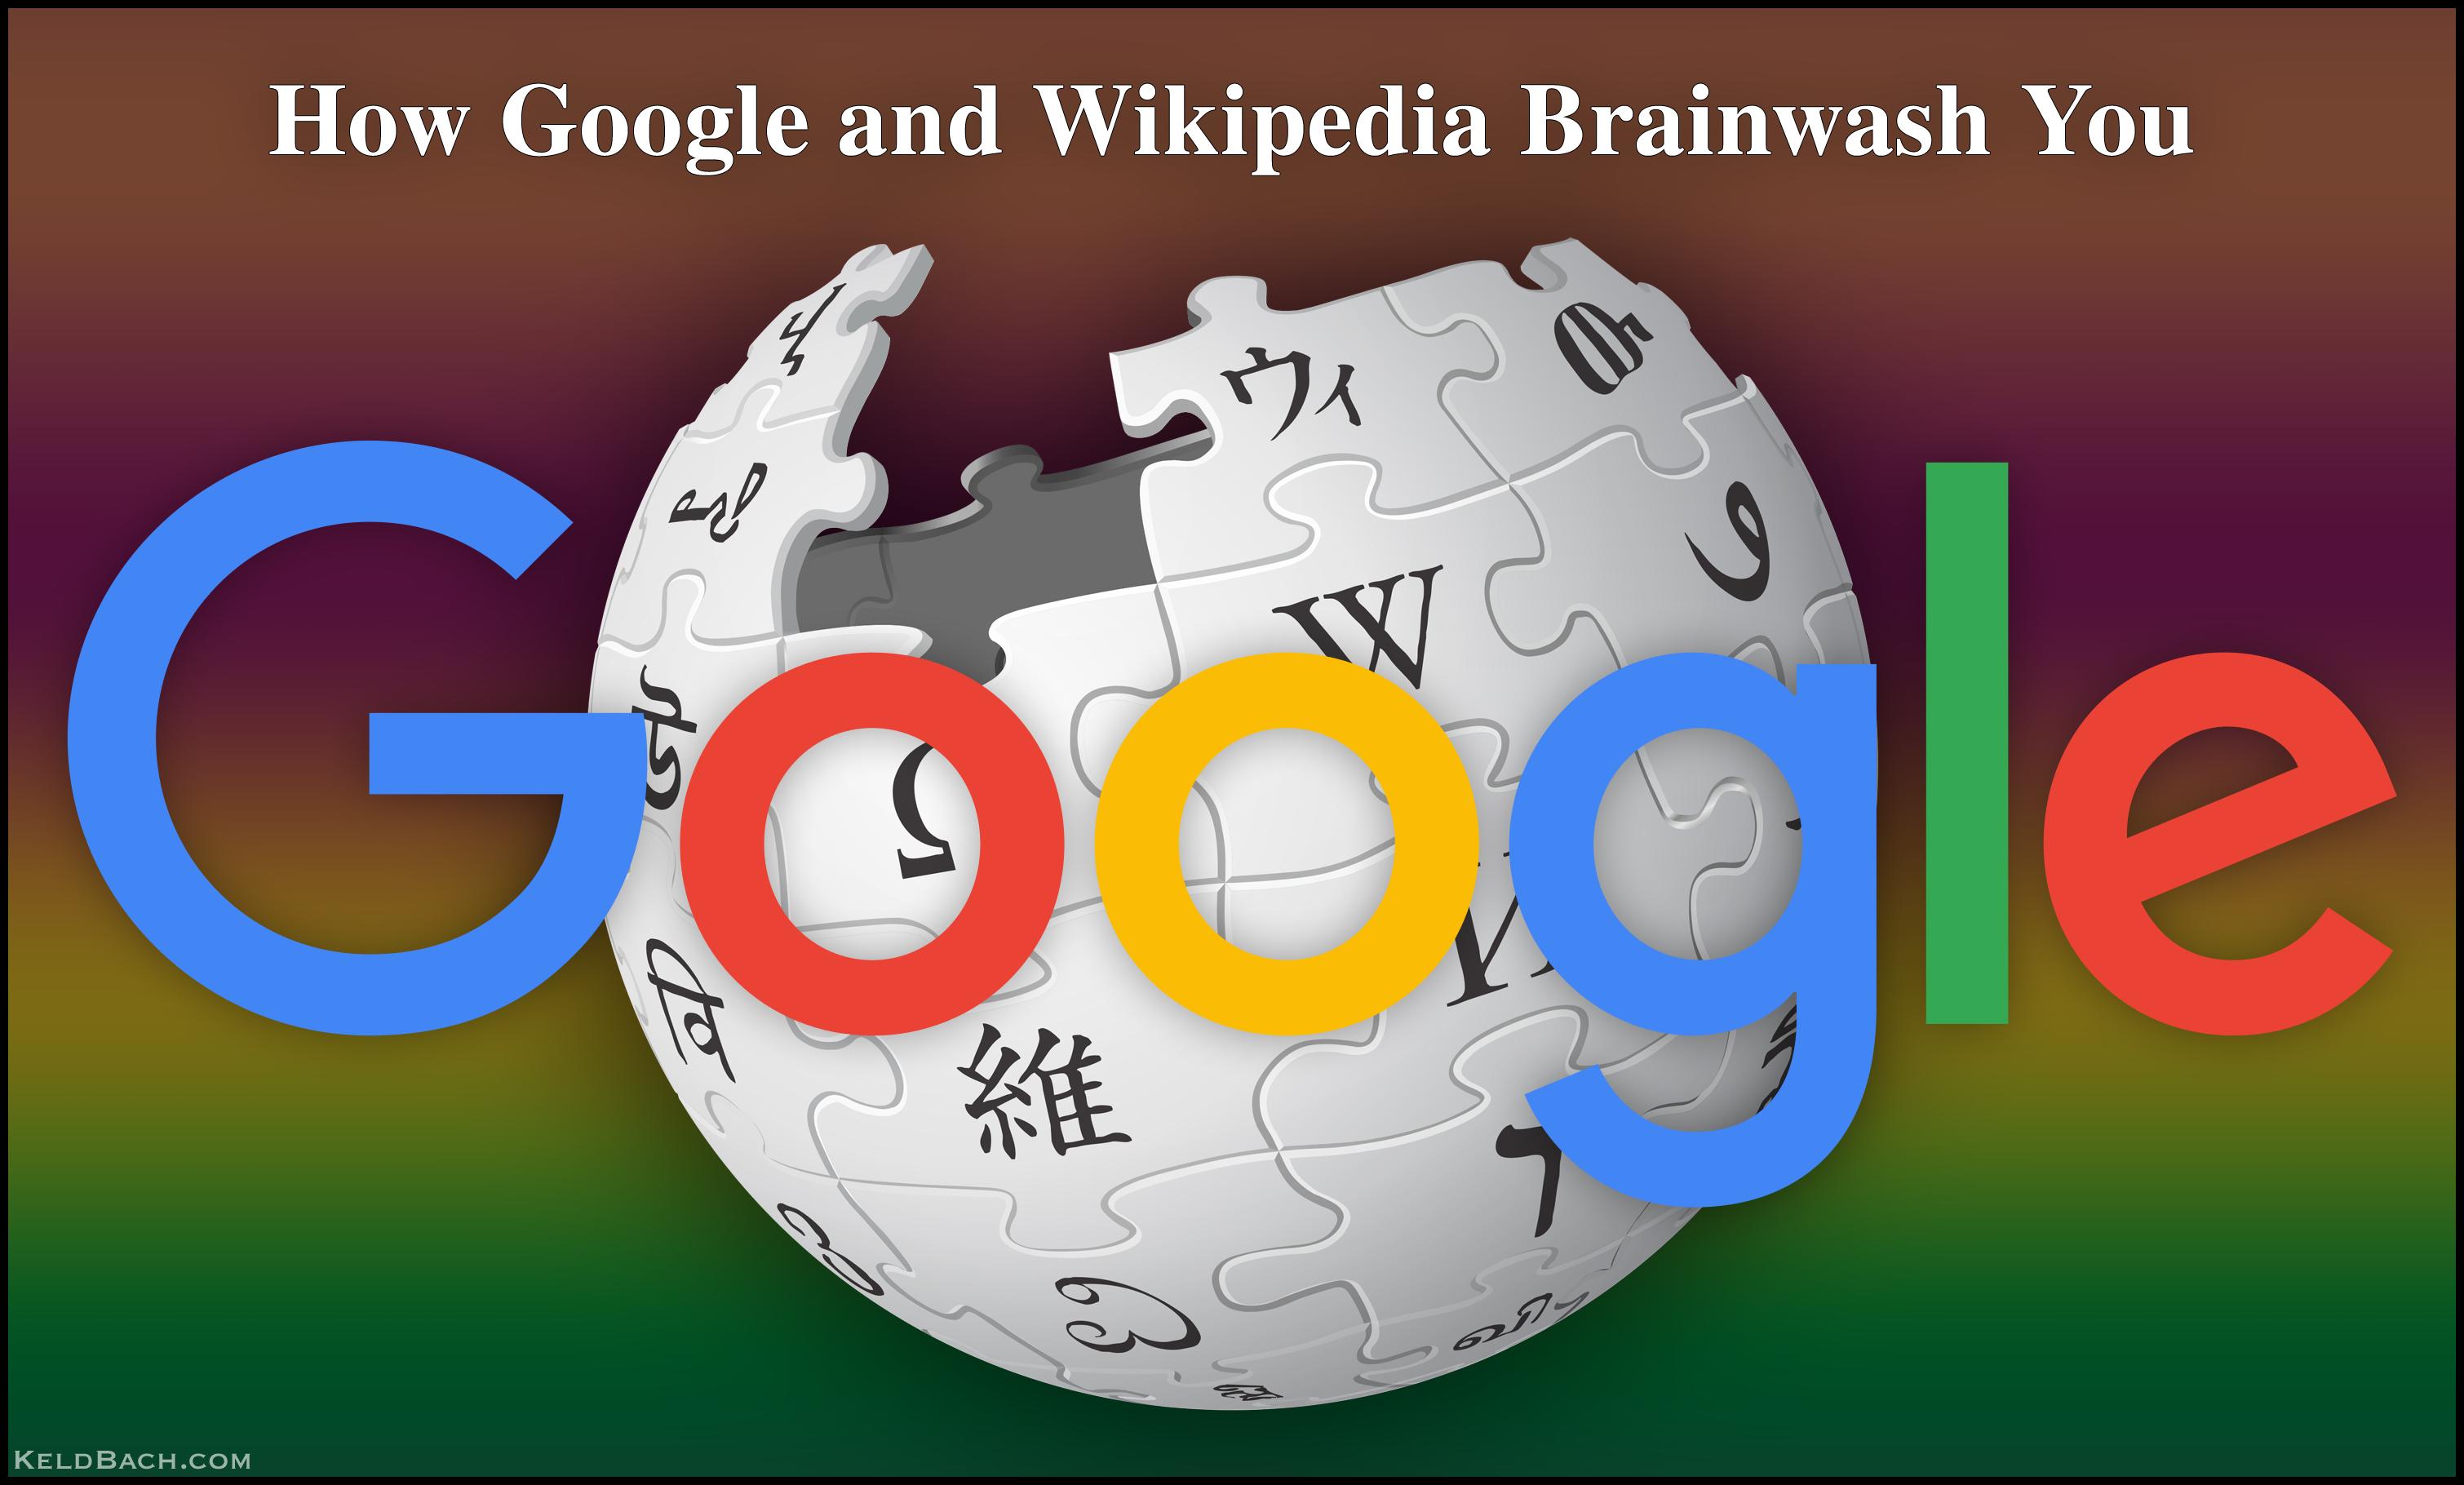 How Google and Wikipedia Brainwash You